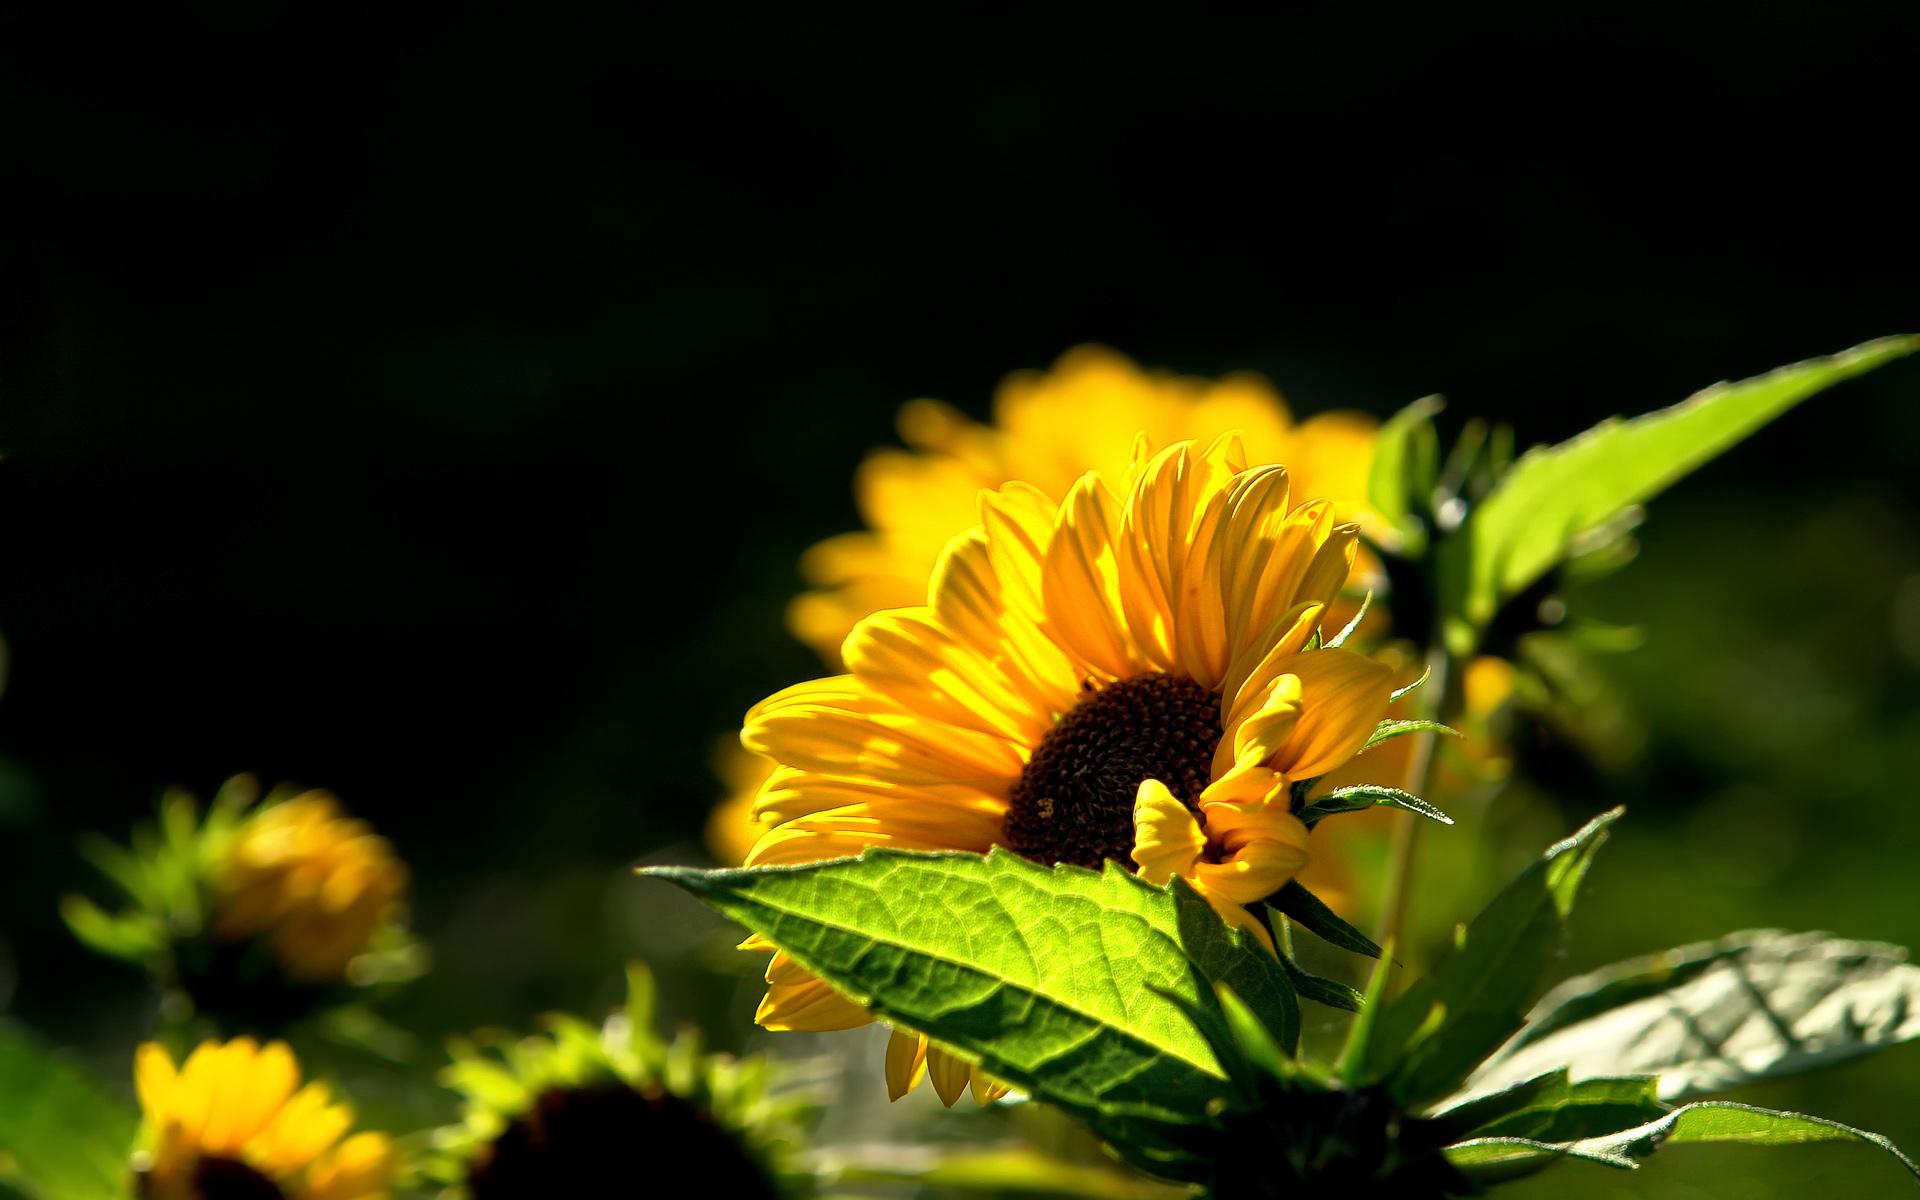 Yellow Flower Picture A1 Hd Desktop Wallpapers 4k Hd